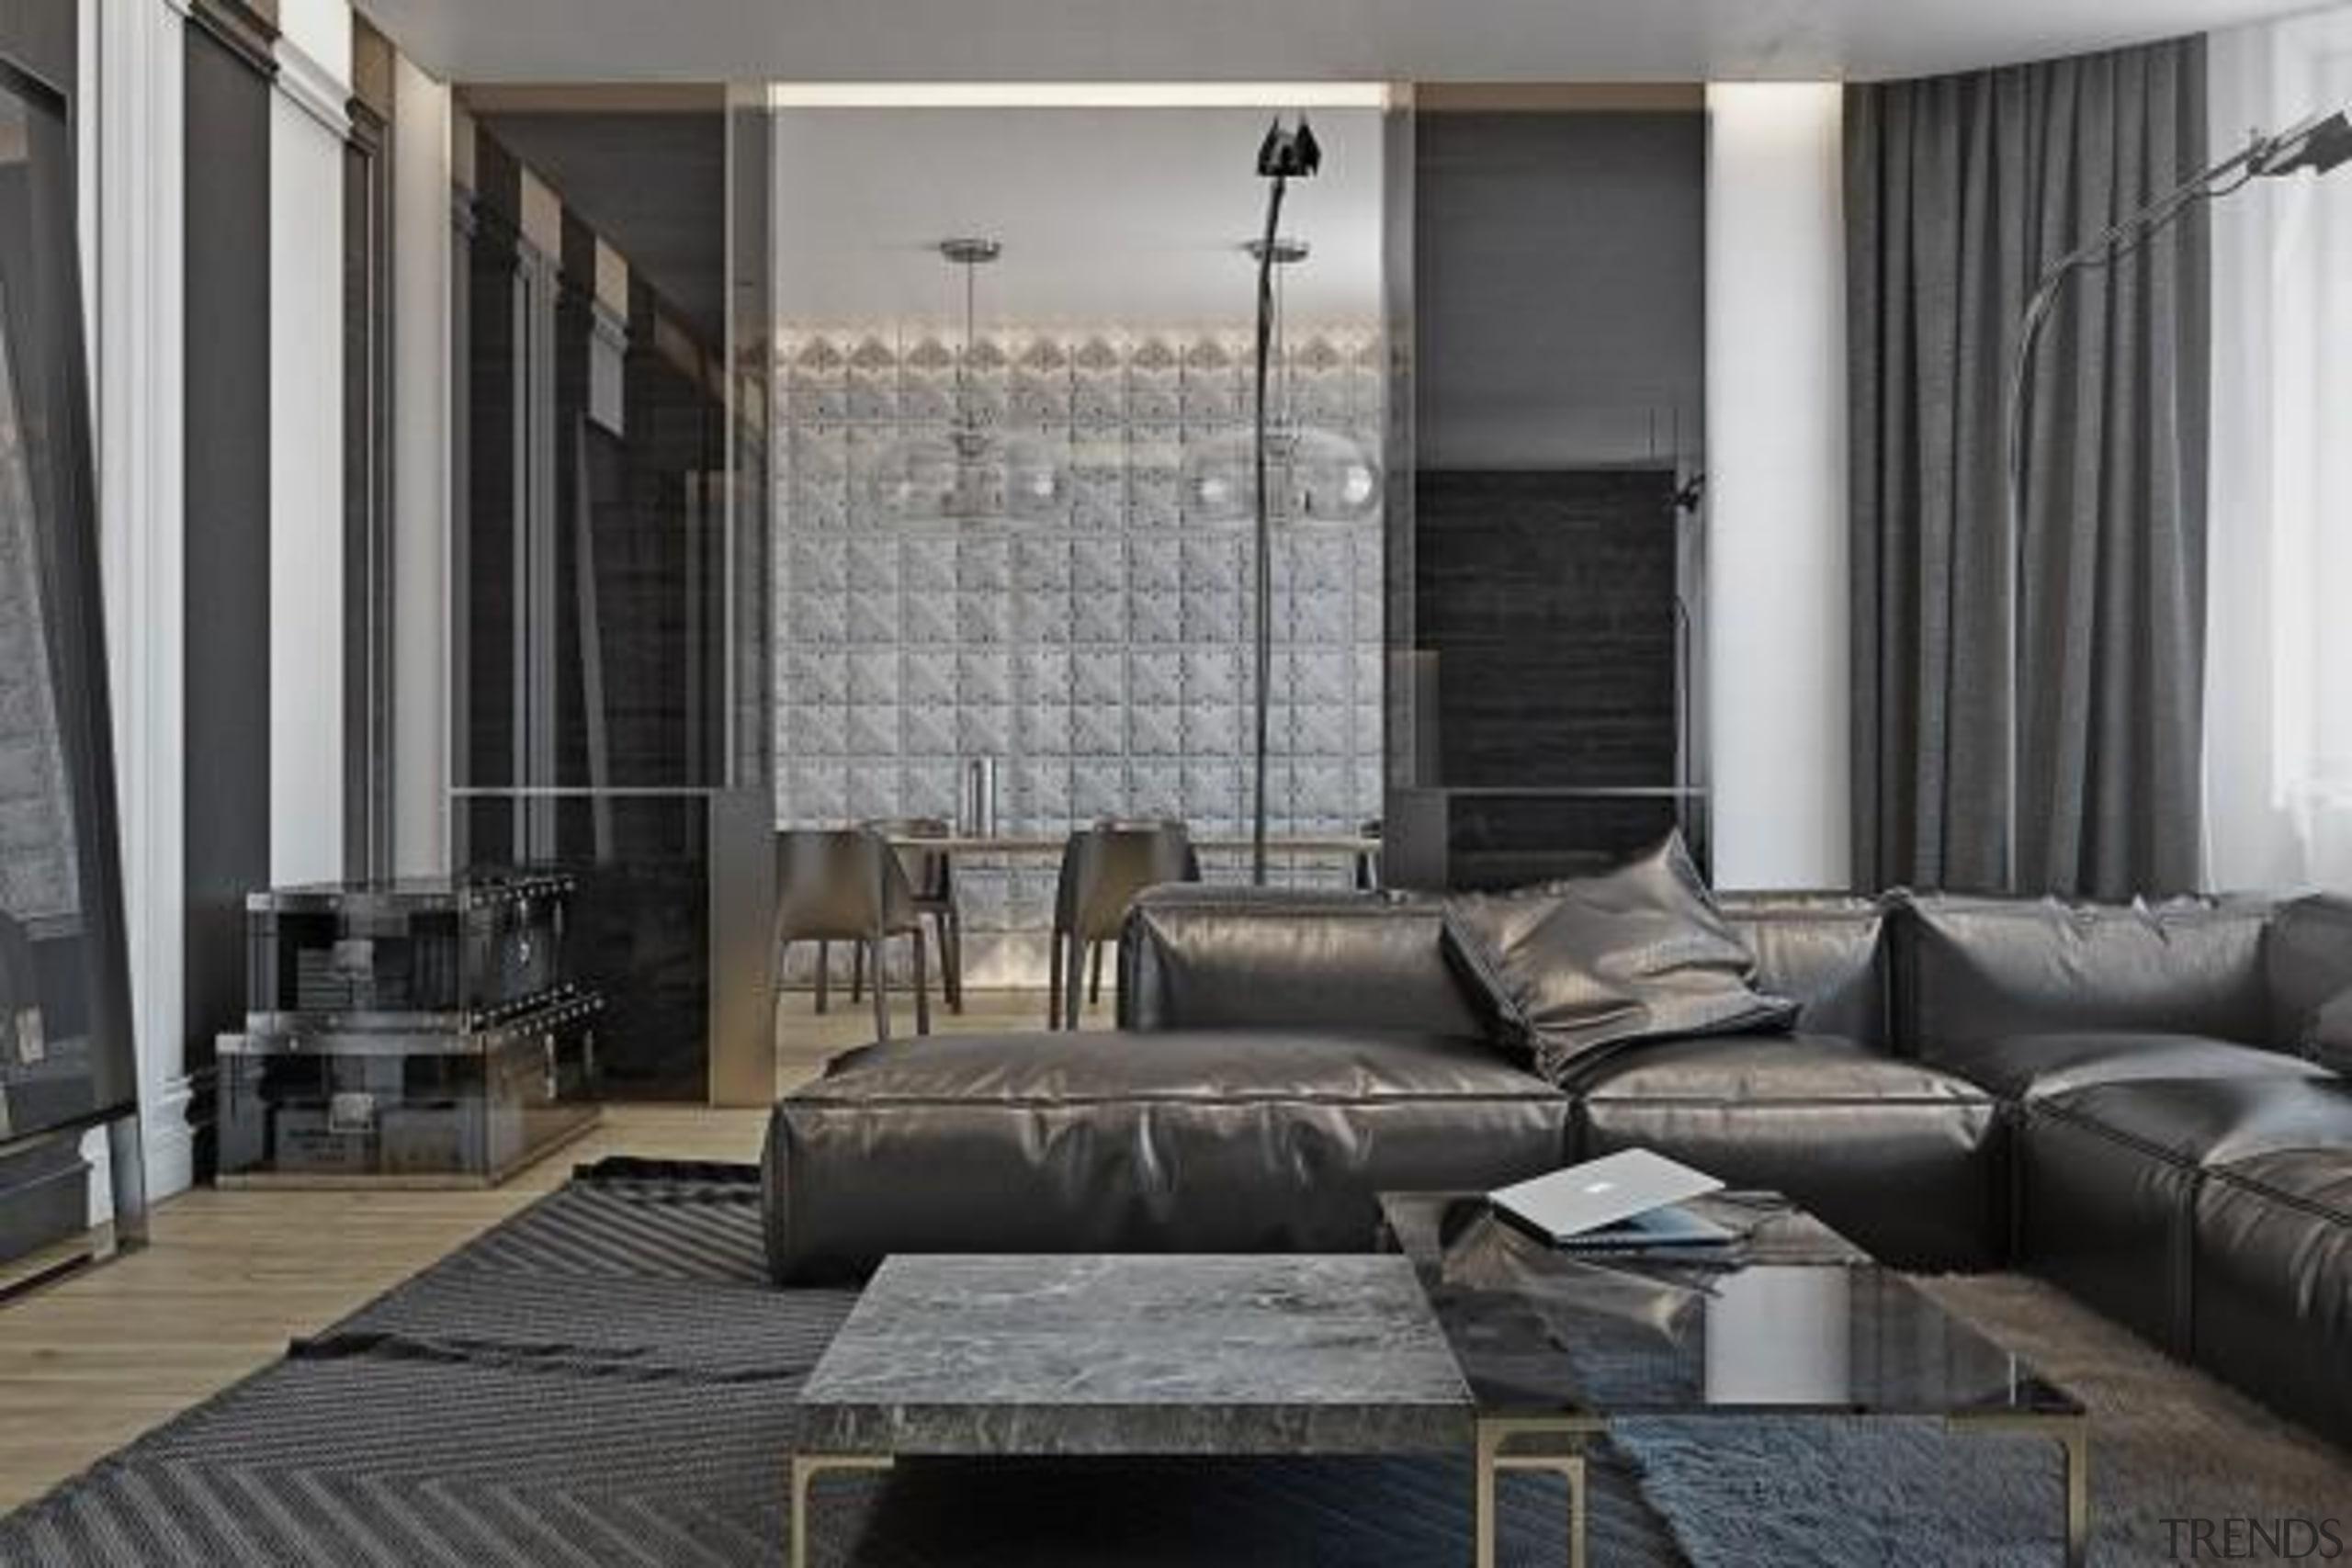 black leather sofa - Masculine Apartments - furniture furniture, interior design, living room, room, wall, window, window treatment, gray, black